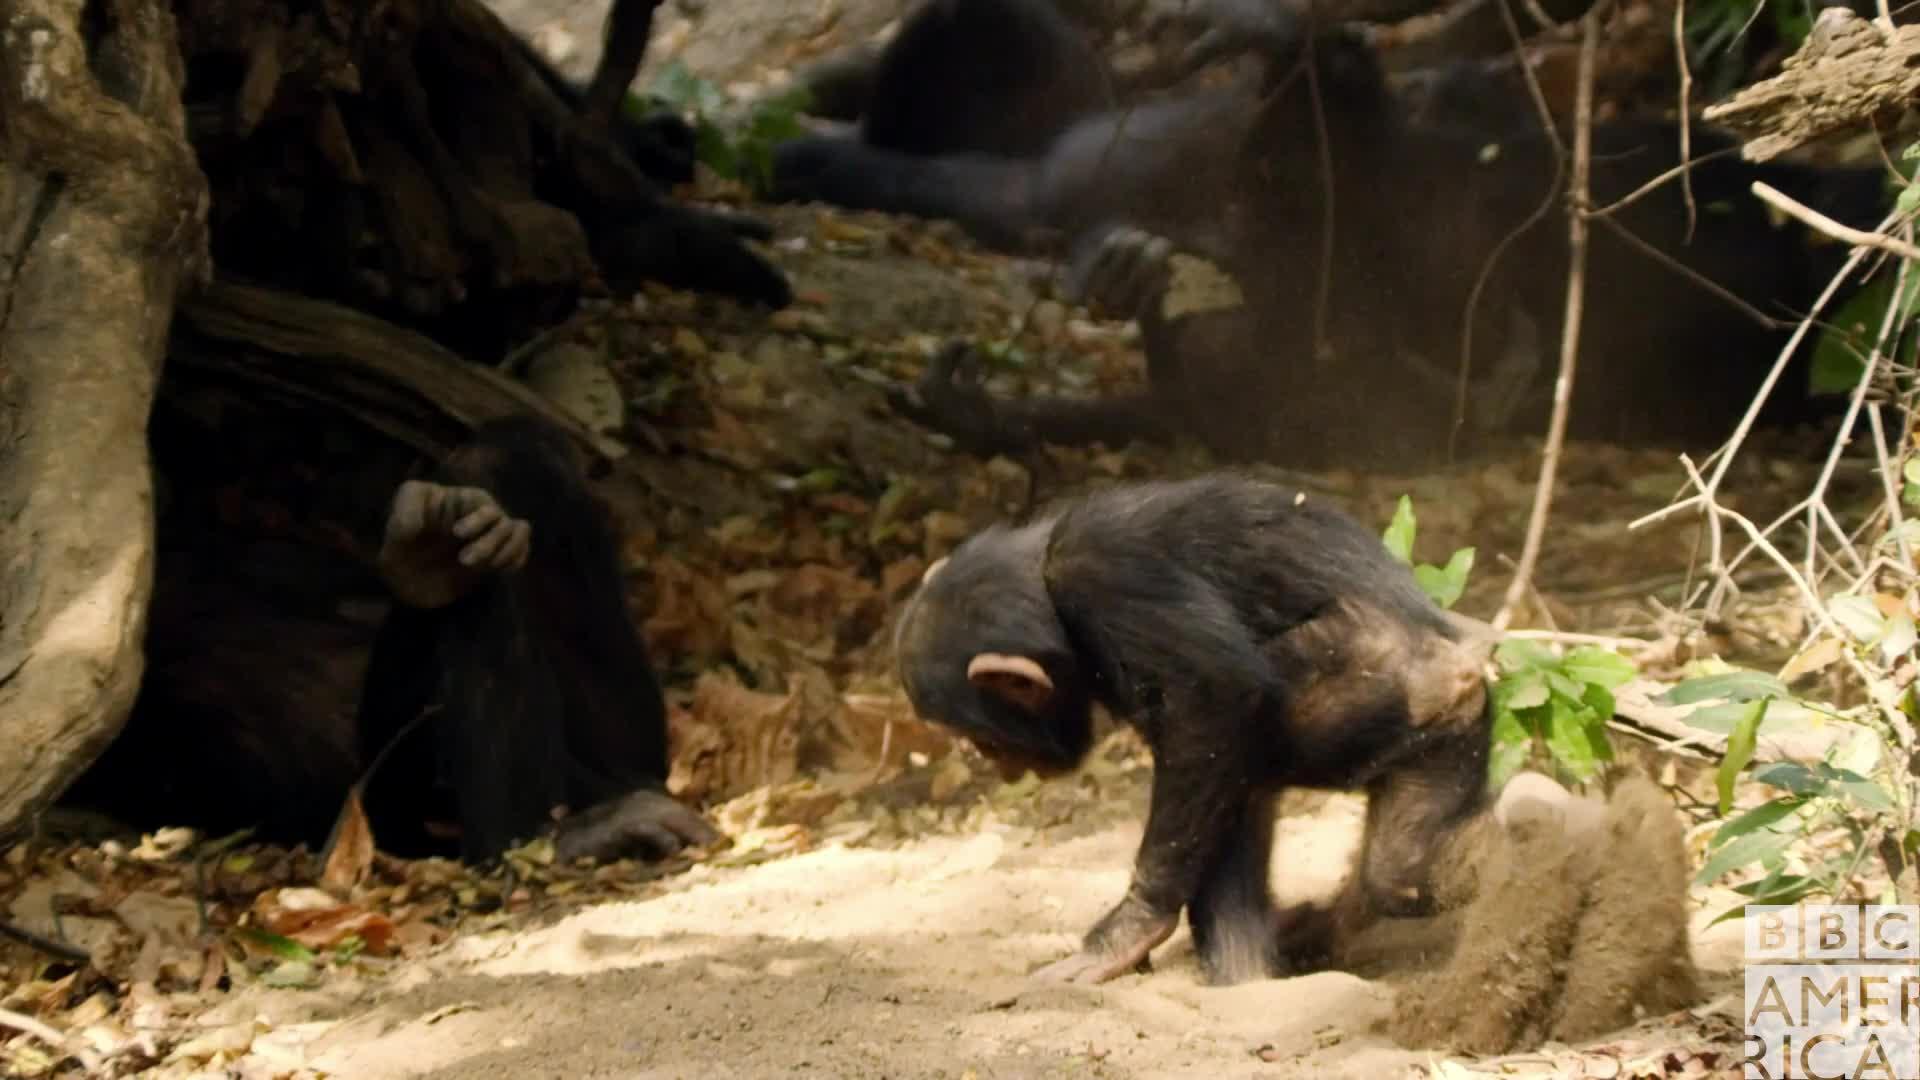 animal, animals, bbc america, bbc america dynasties, bbc america: dynasties, chimp, chimpanzee, chimpanzees, chimps, dynasties, Dynasties Chimp Hot and Exhausted GIFs